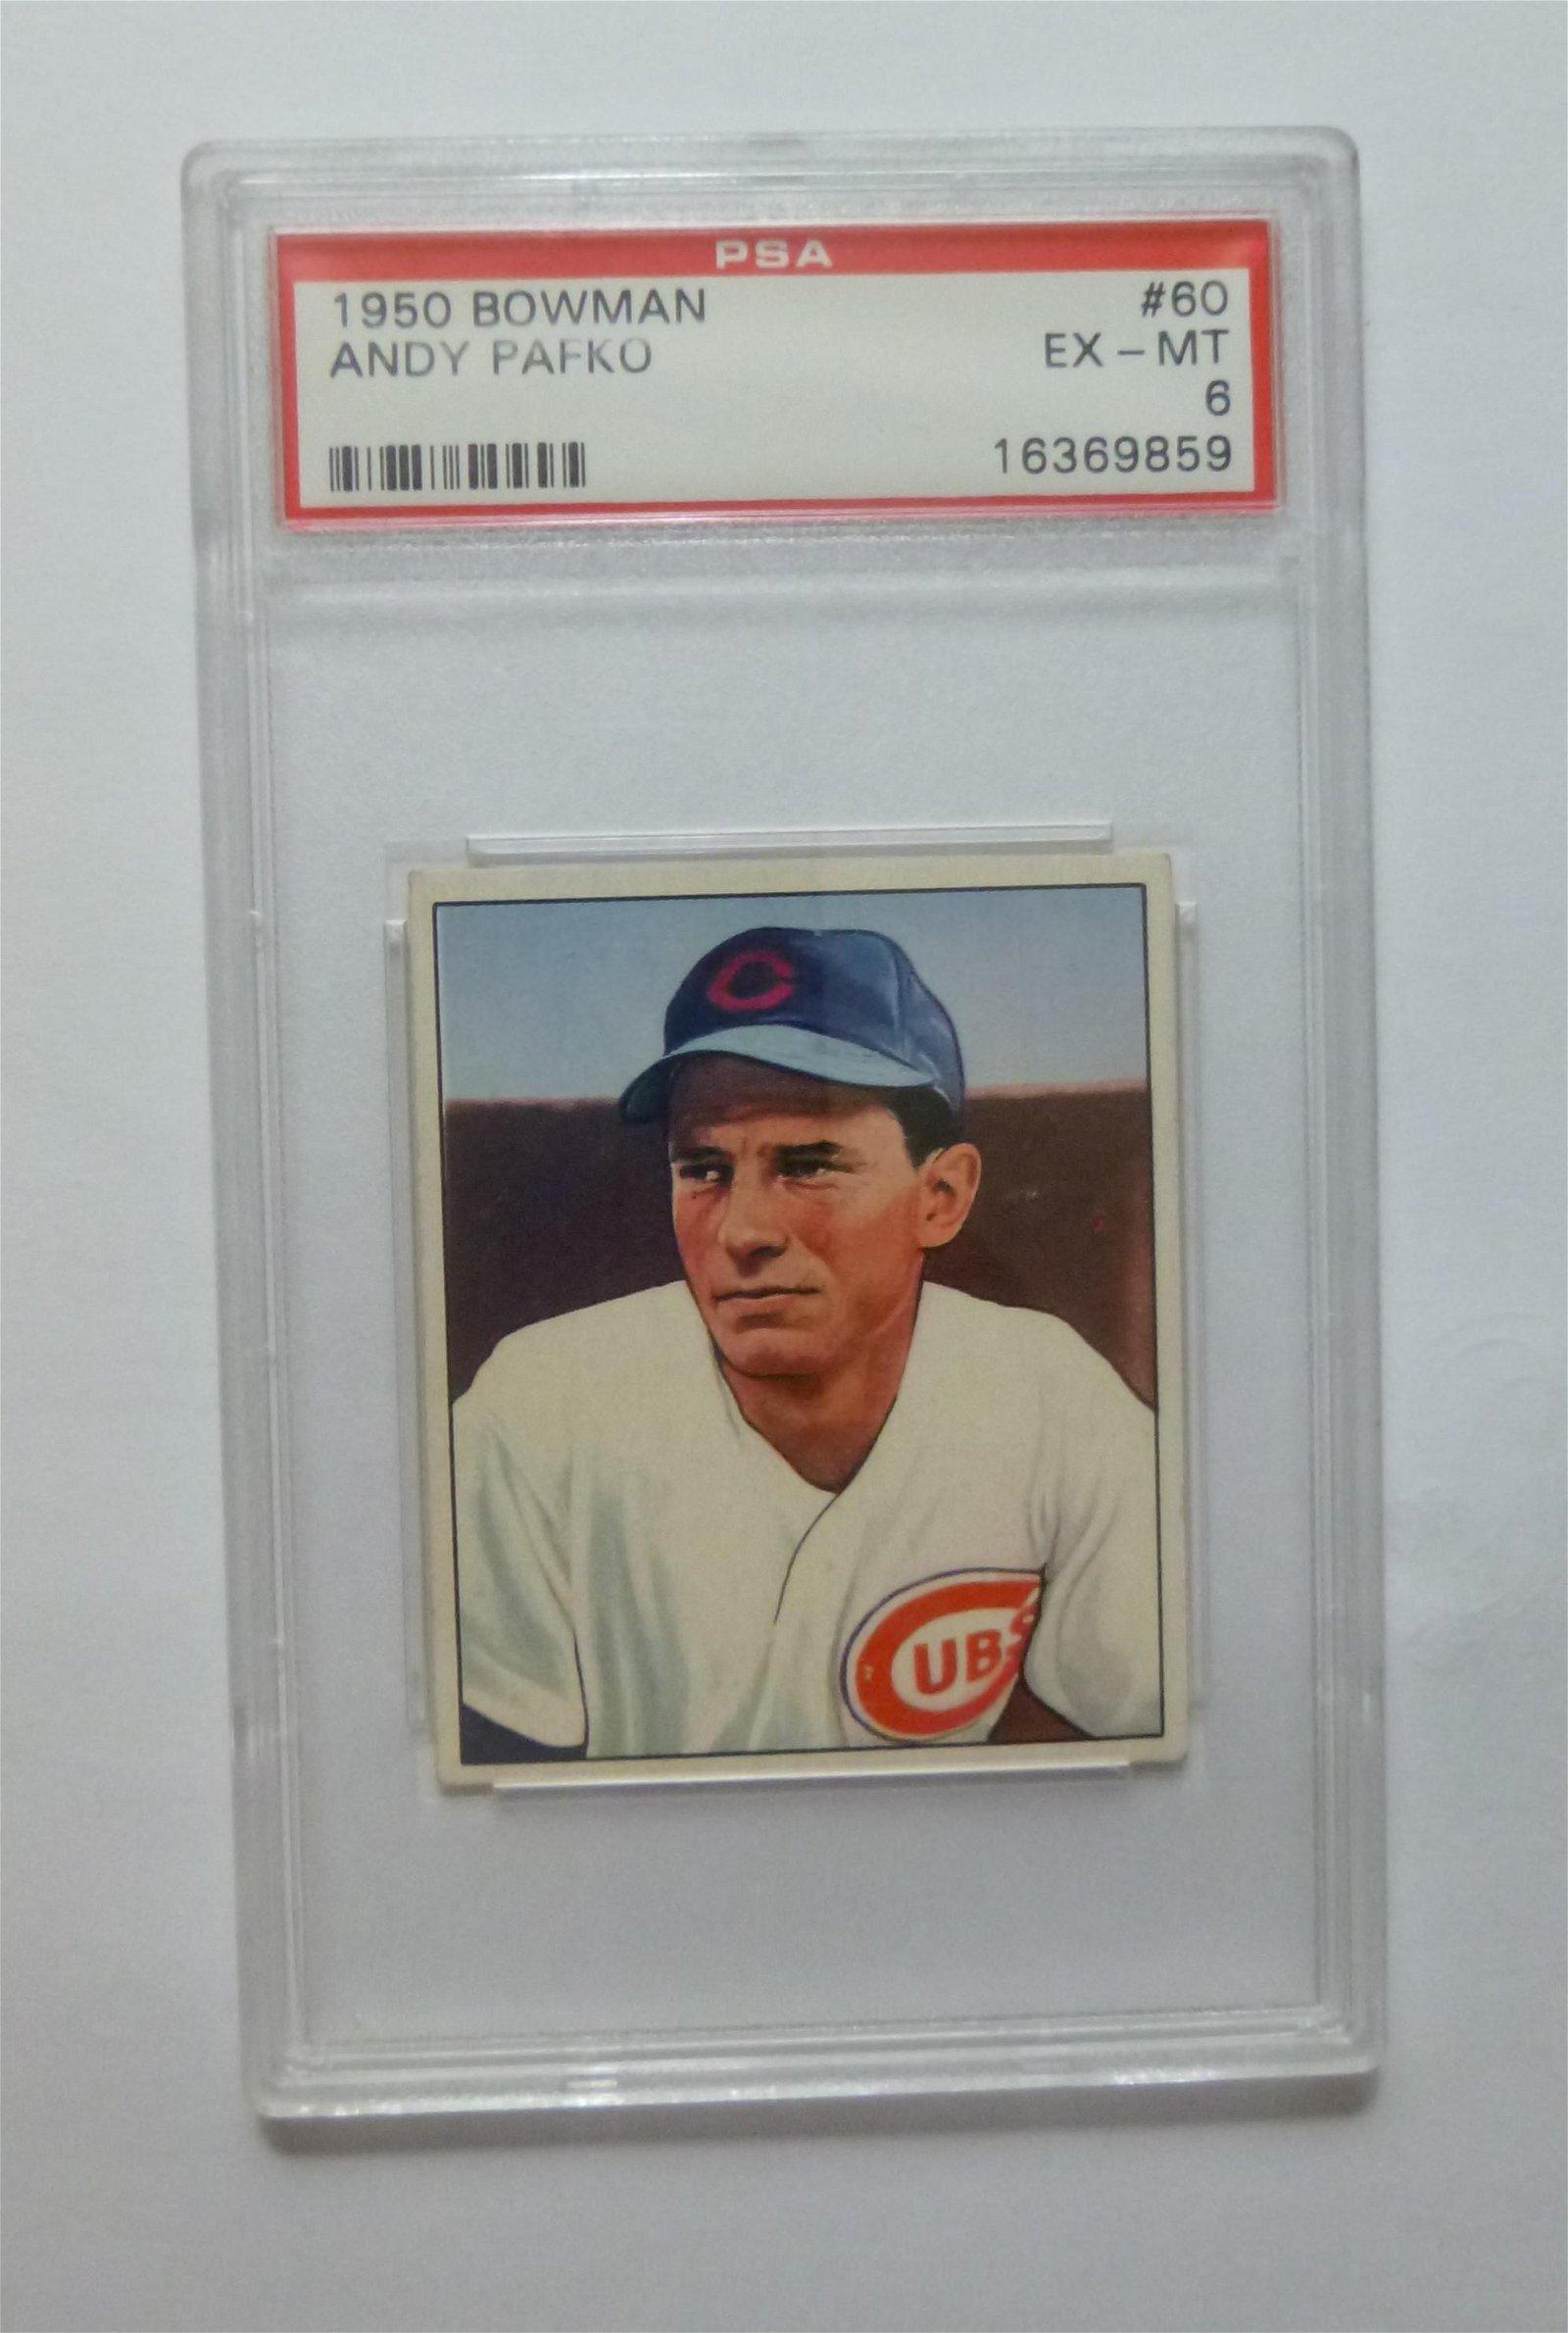 1950 Bowman #60 Andy Pafko PSA 6